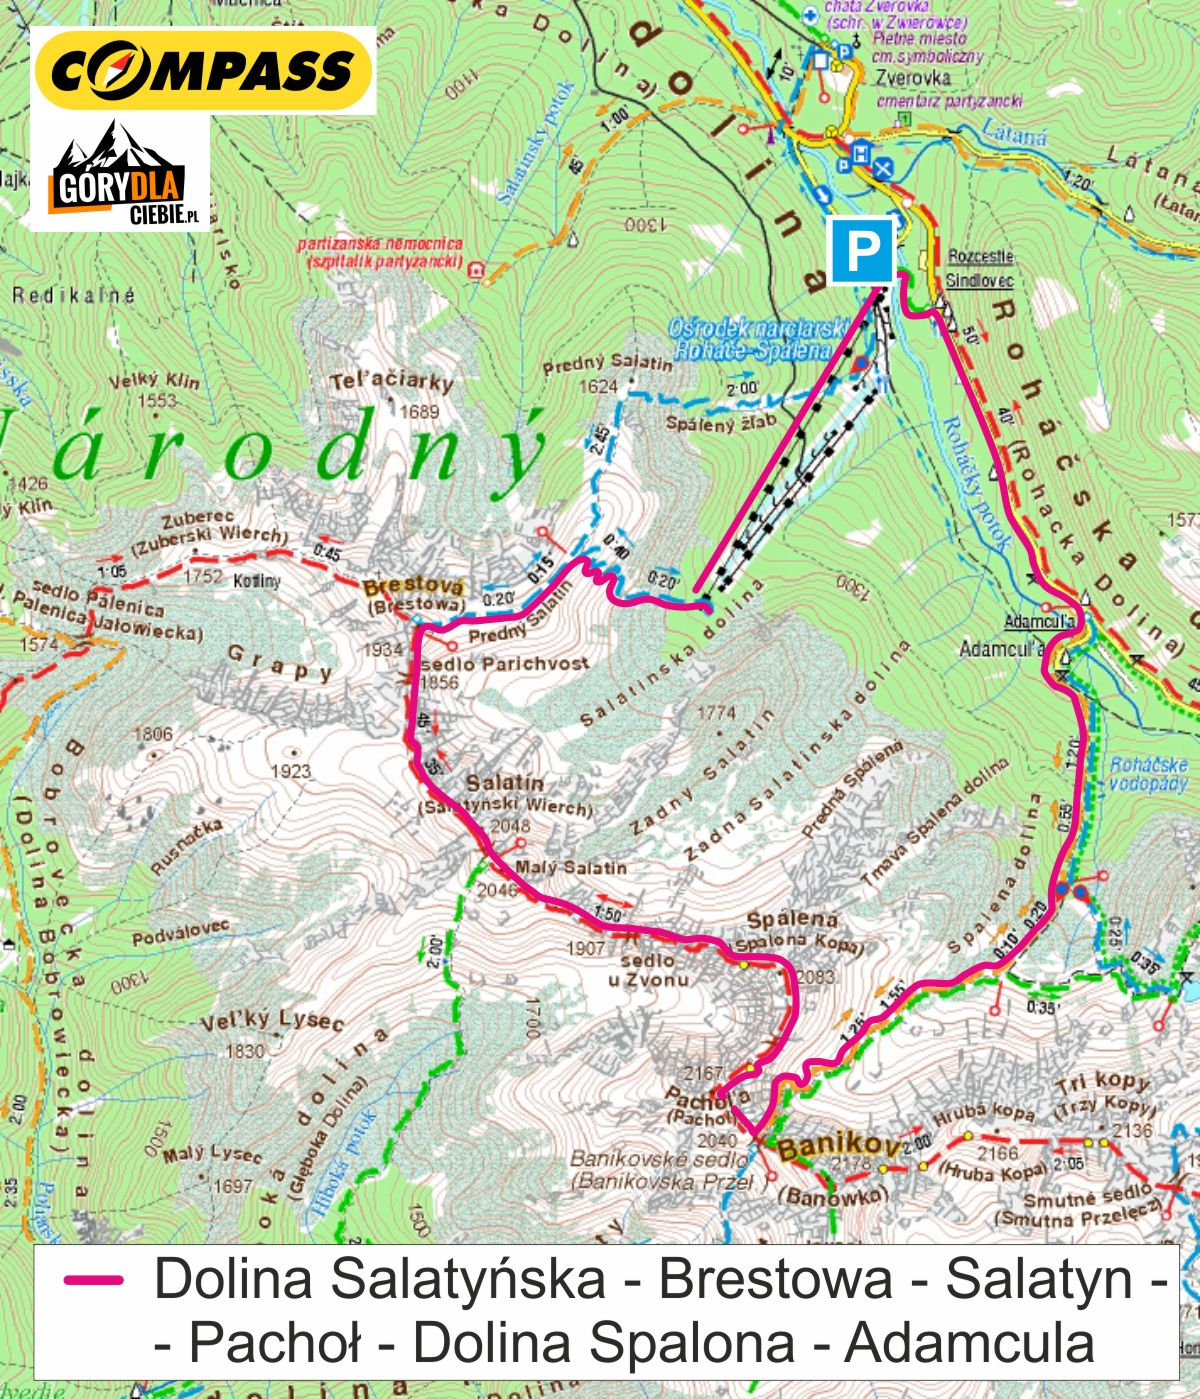 Salatyn i Pachoł - mapa